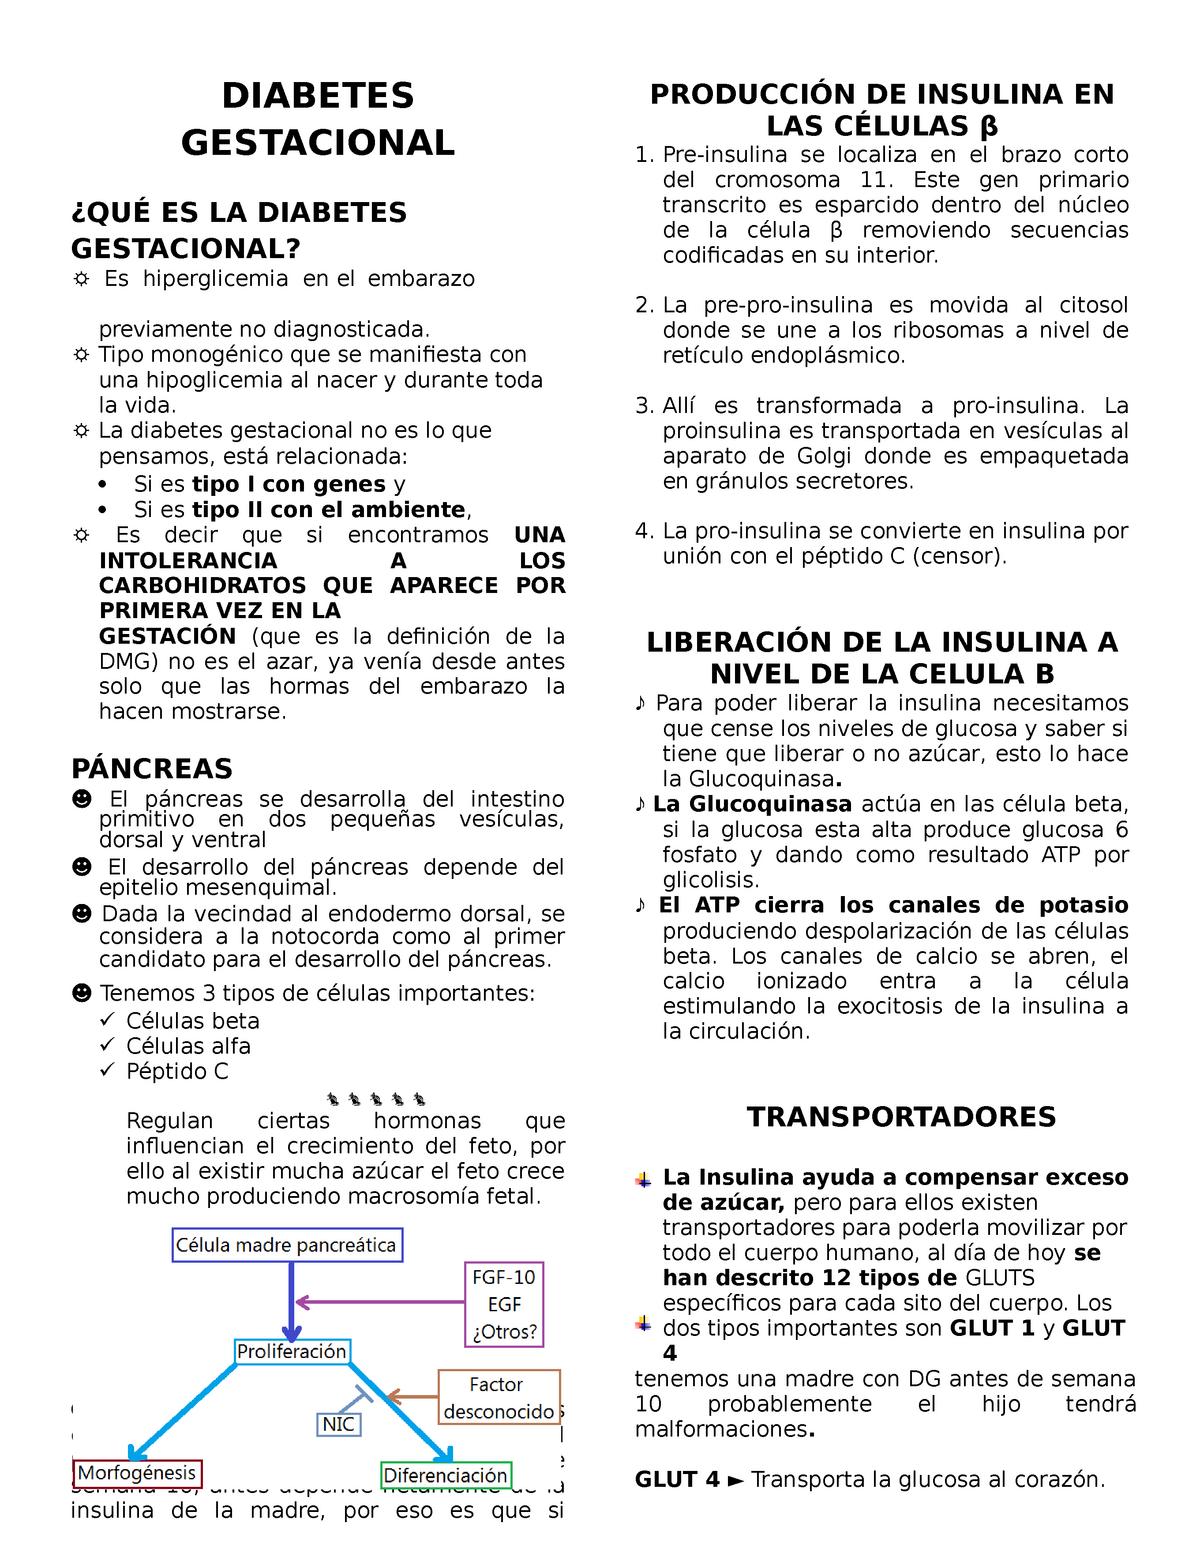 nivel de péptido c en diabetes